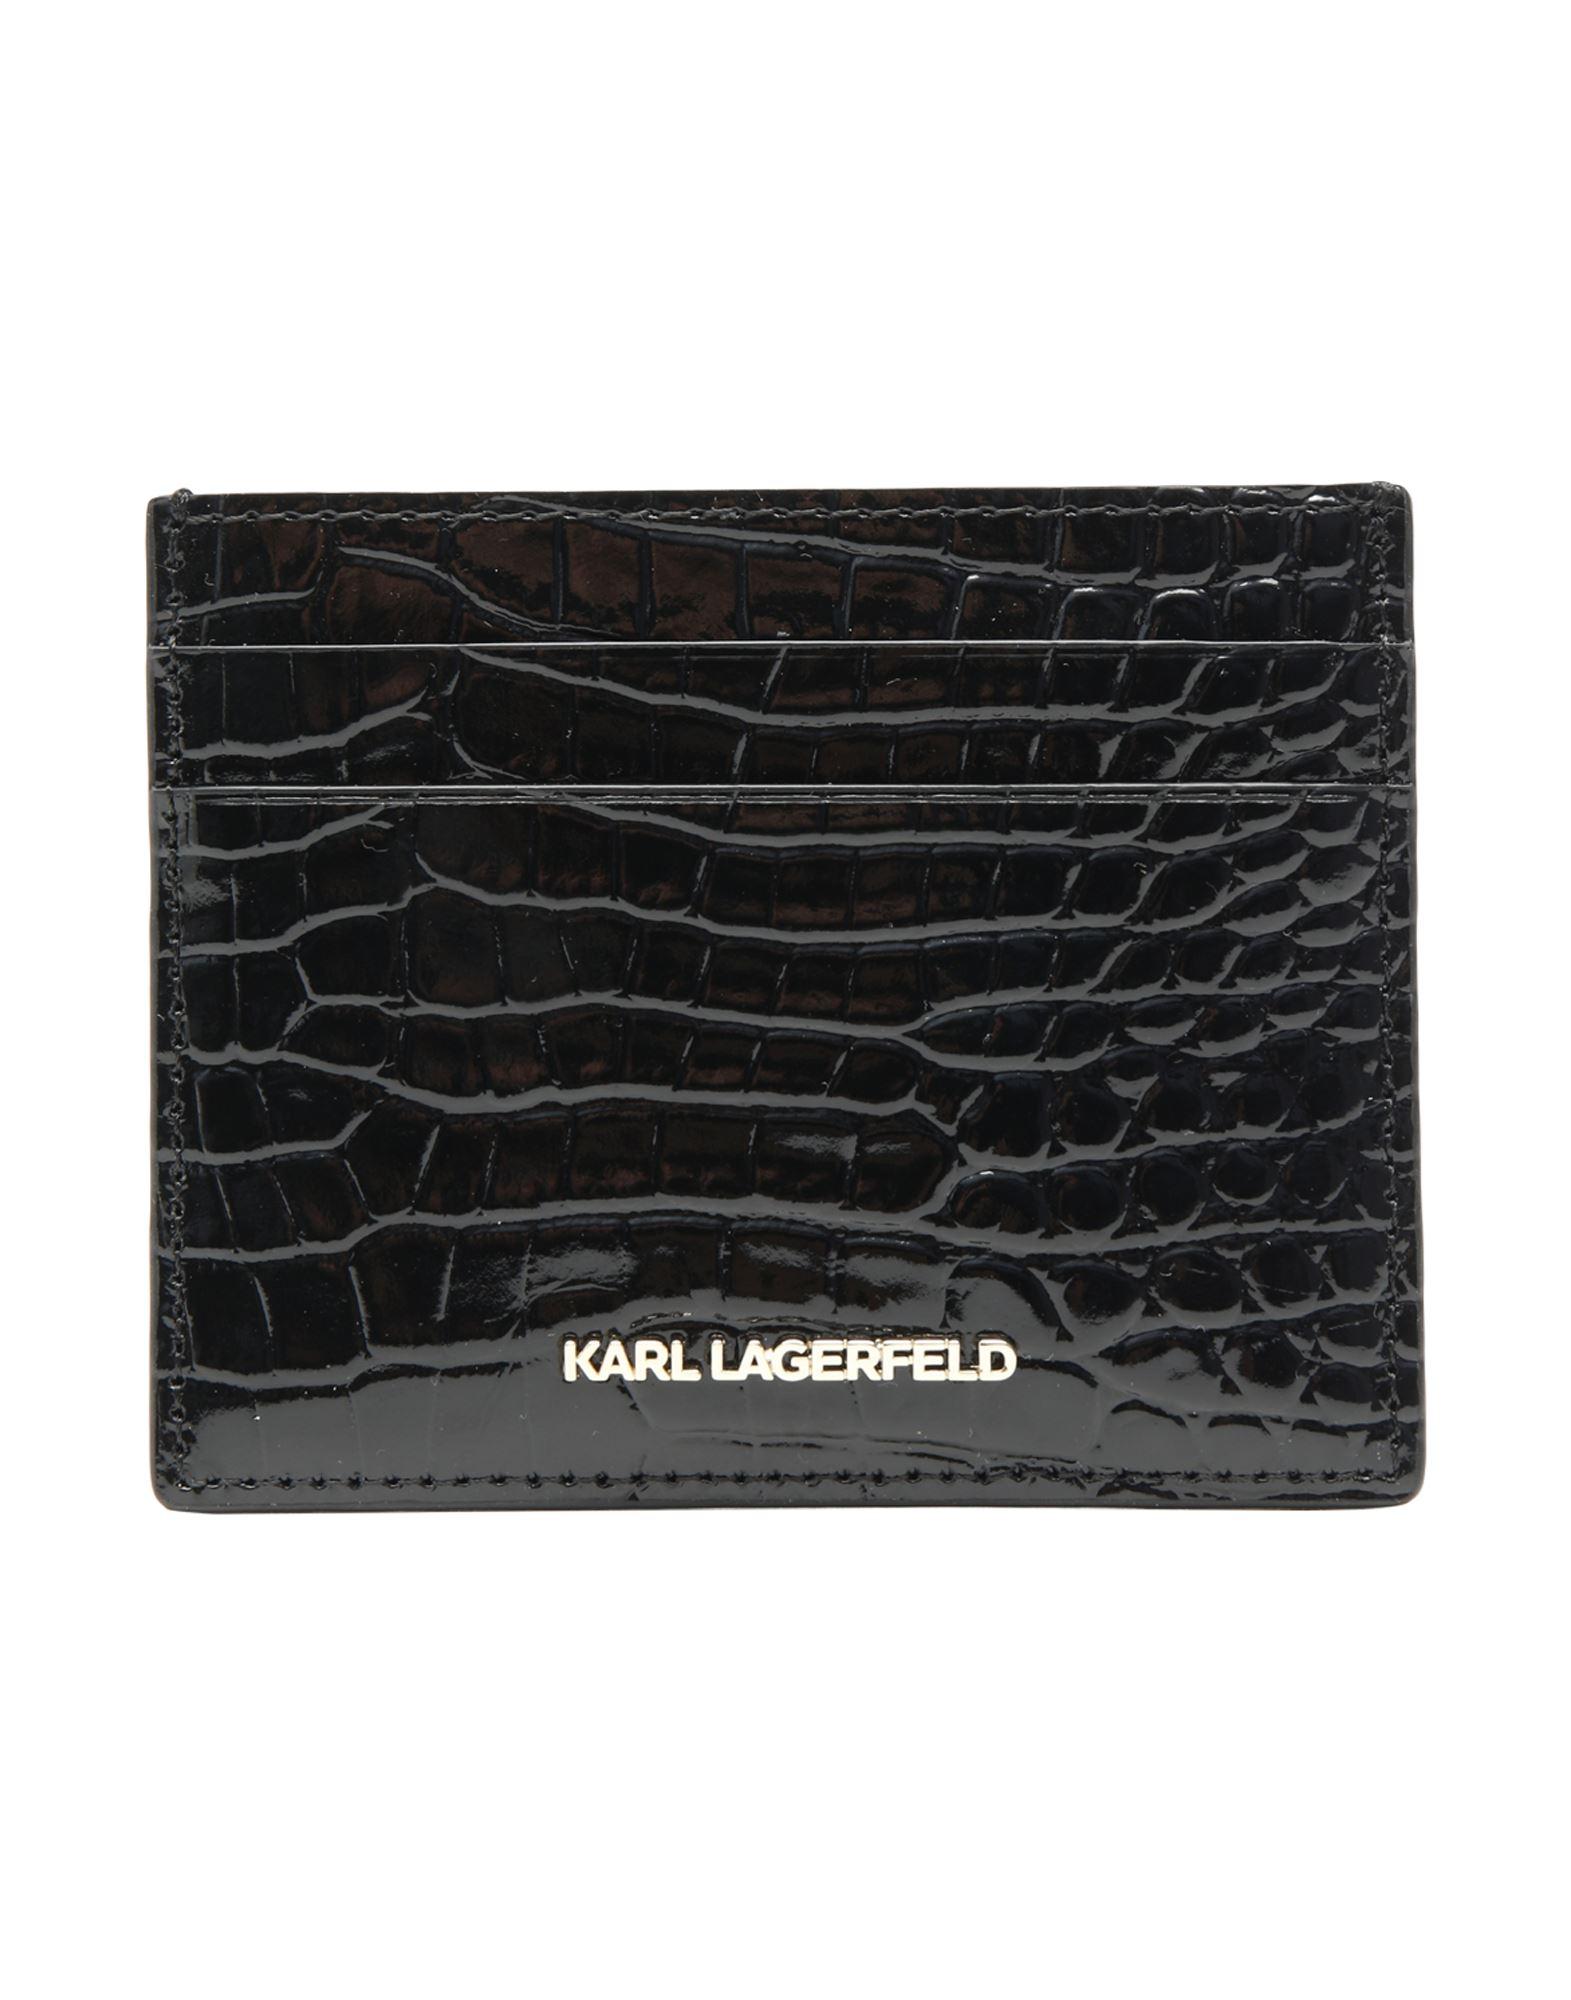 чехлы для телефонов karl lagerfeld чехол lagerfeld для iphone x liquid glitter karl signature hard tpu transp gold KARL LAGERFELD Чехол для документов